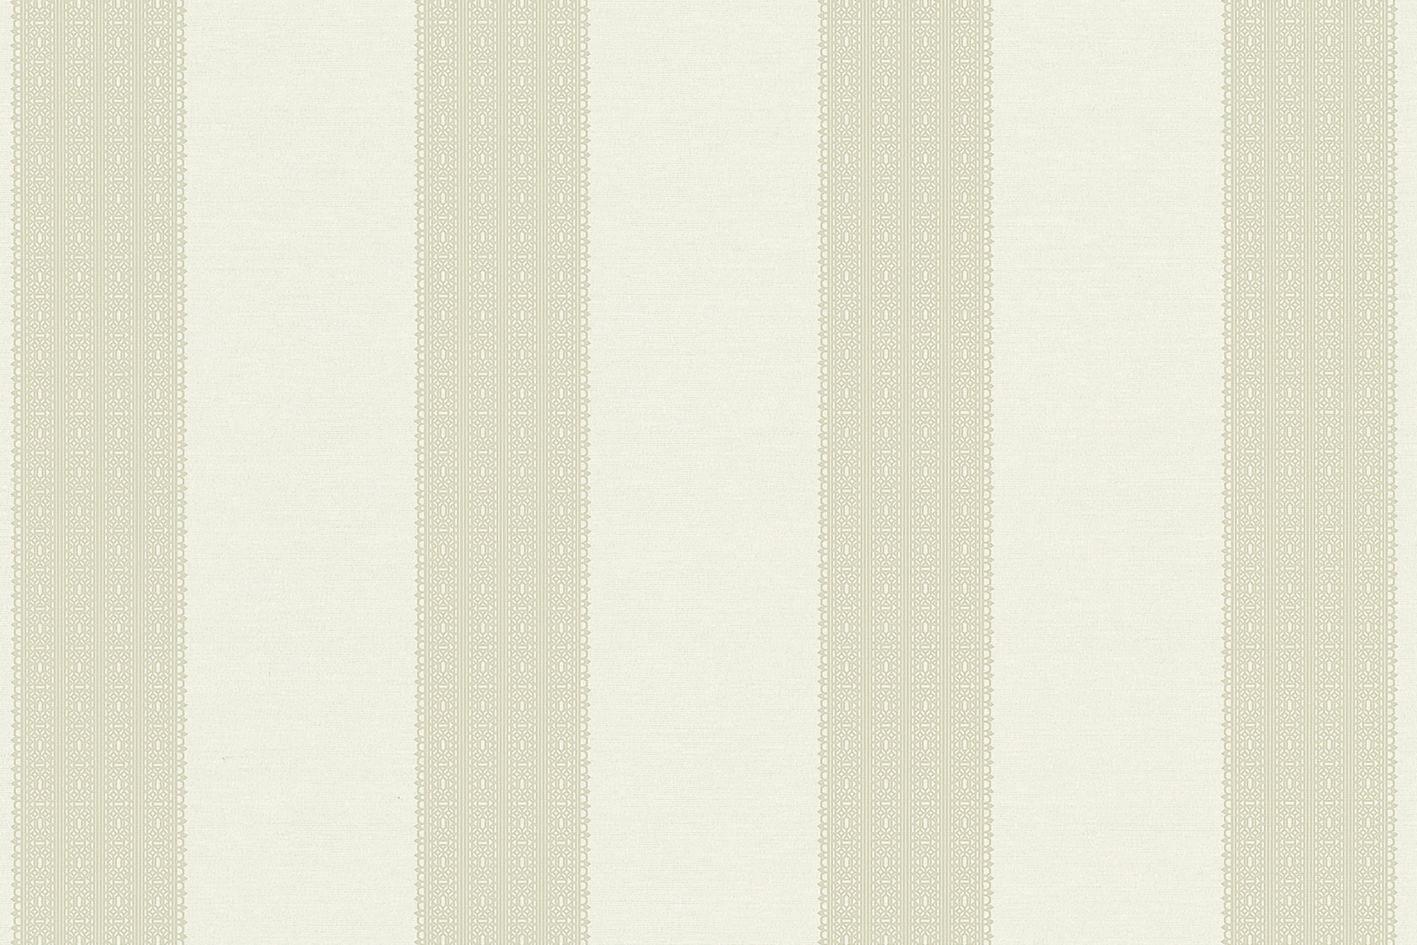 Wallcovering_(Lace Stripe) VERA12-4